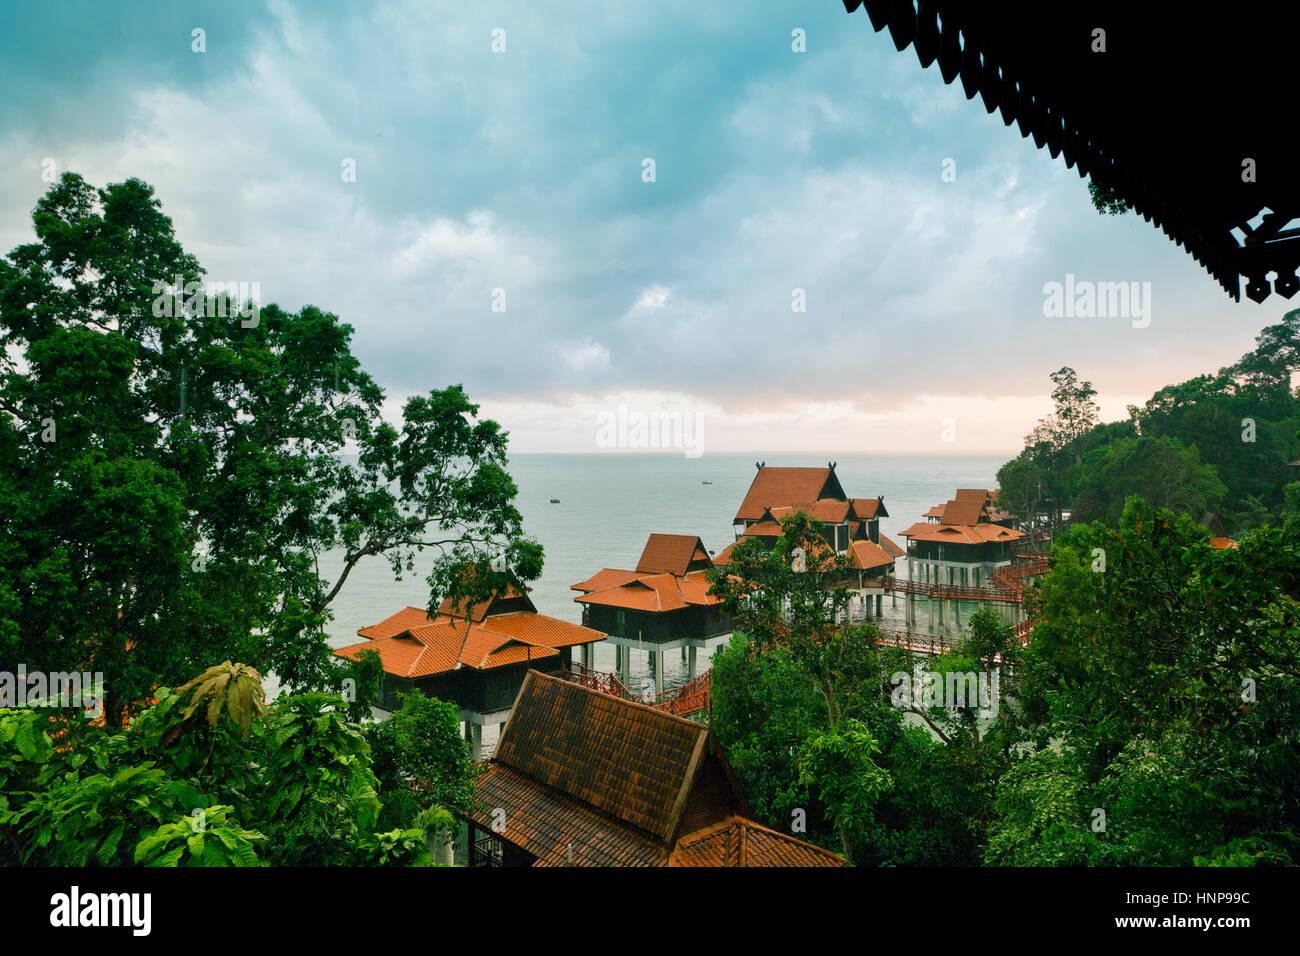 Luxury hotel bungalows on water, Langkawi Island, Malaysia - Stock Image